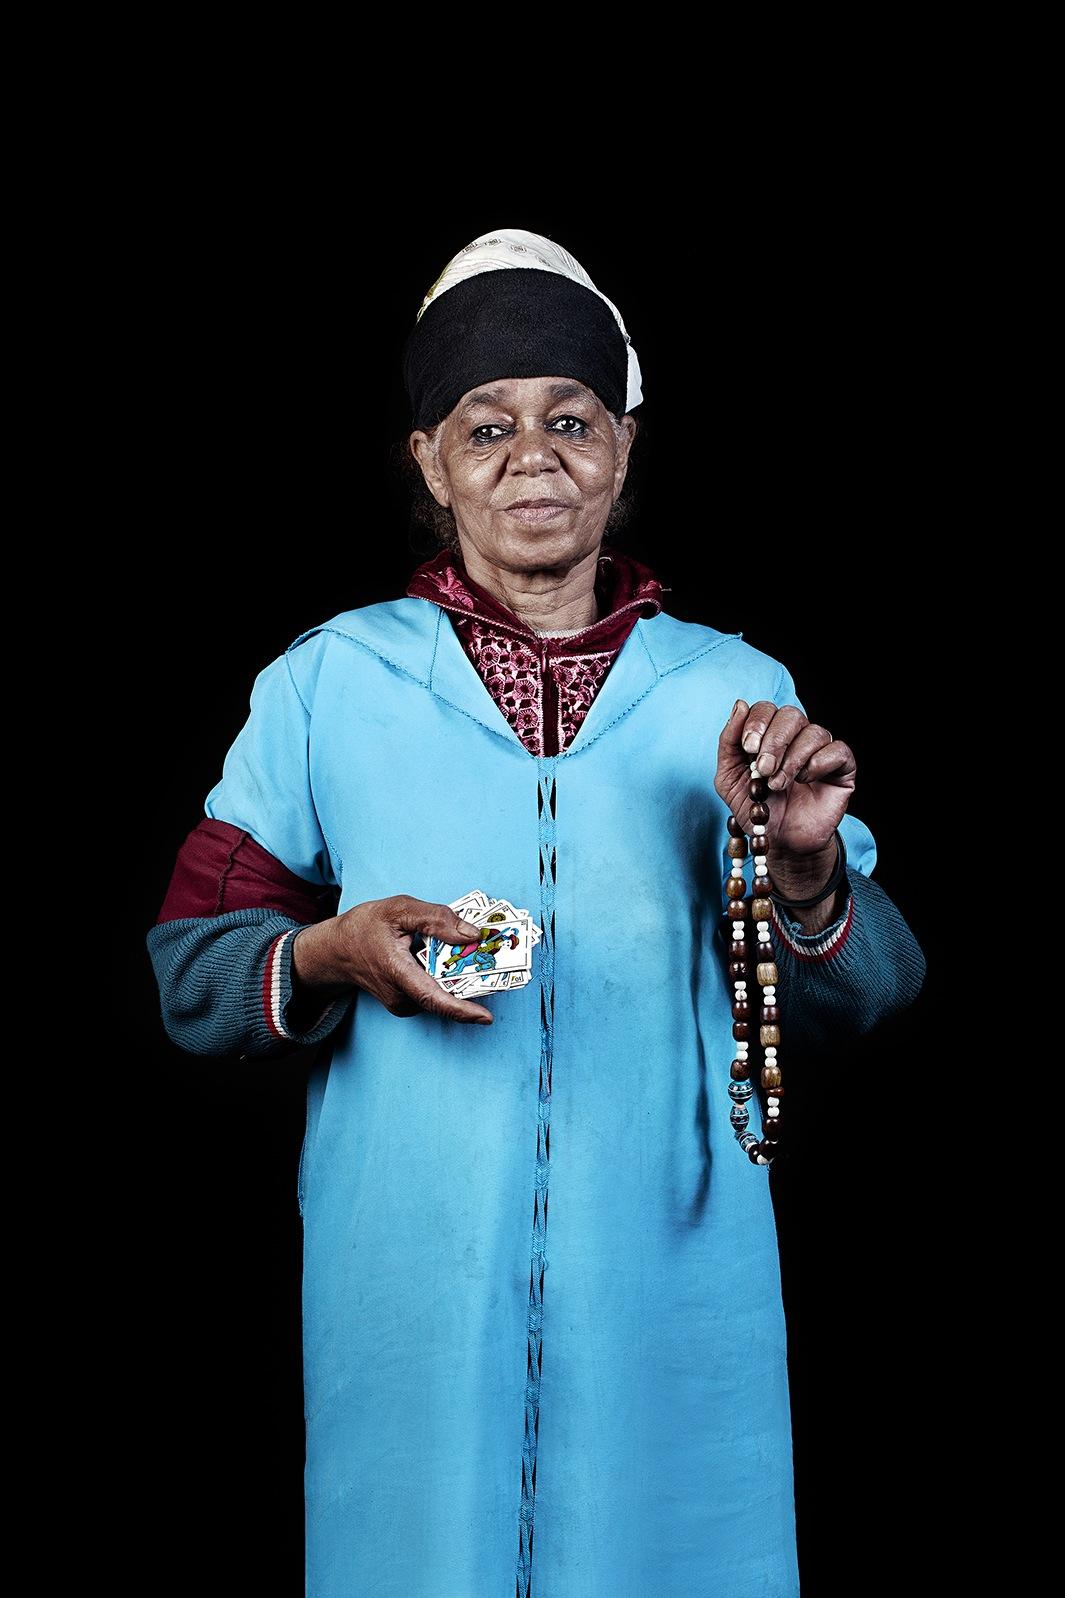 Марокканцы - портреты от Лейлы Алауи-08